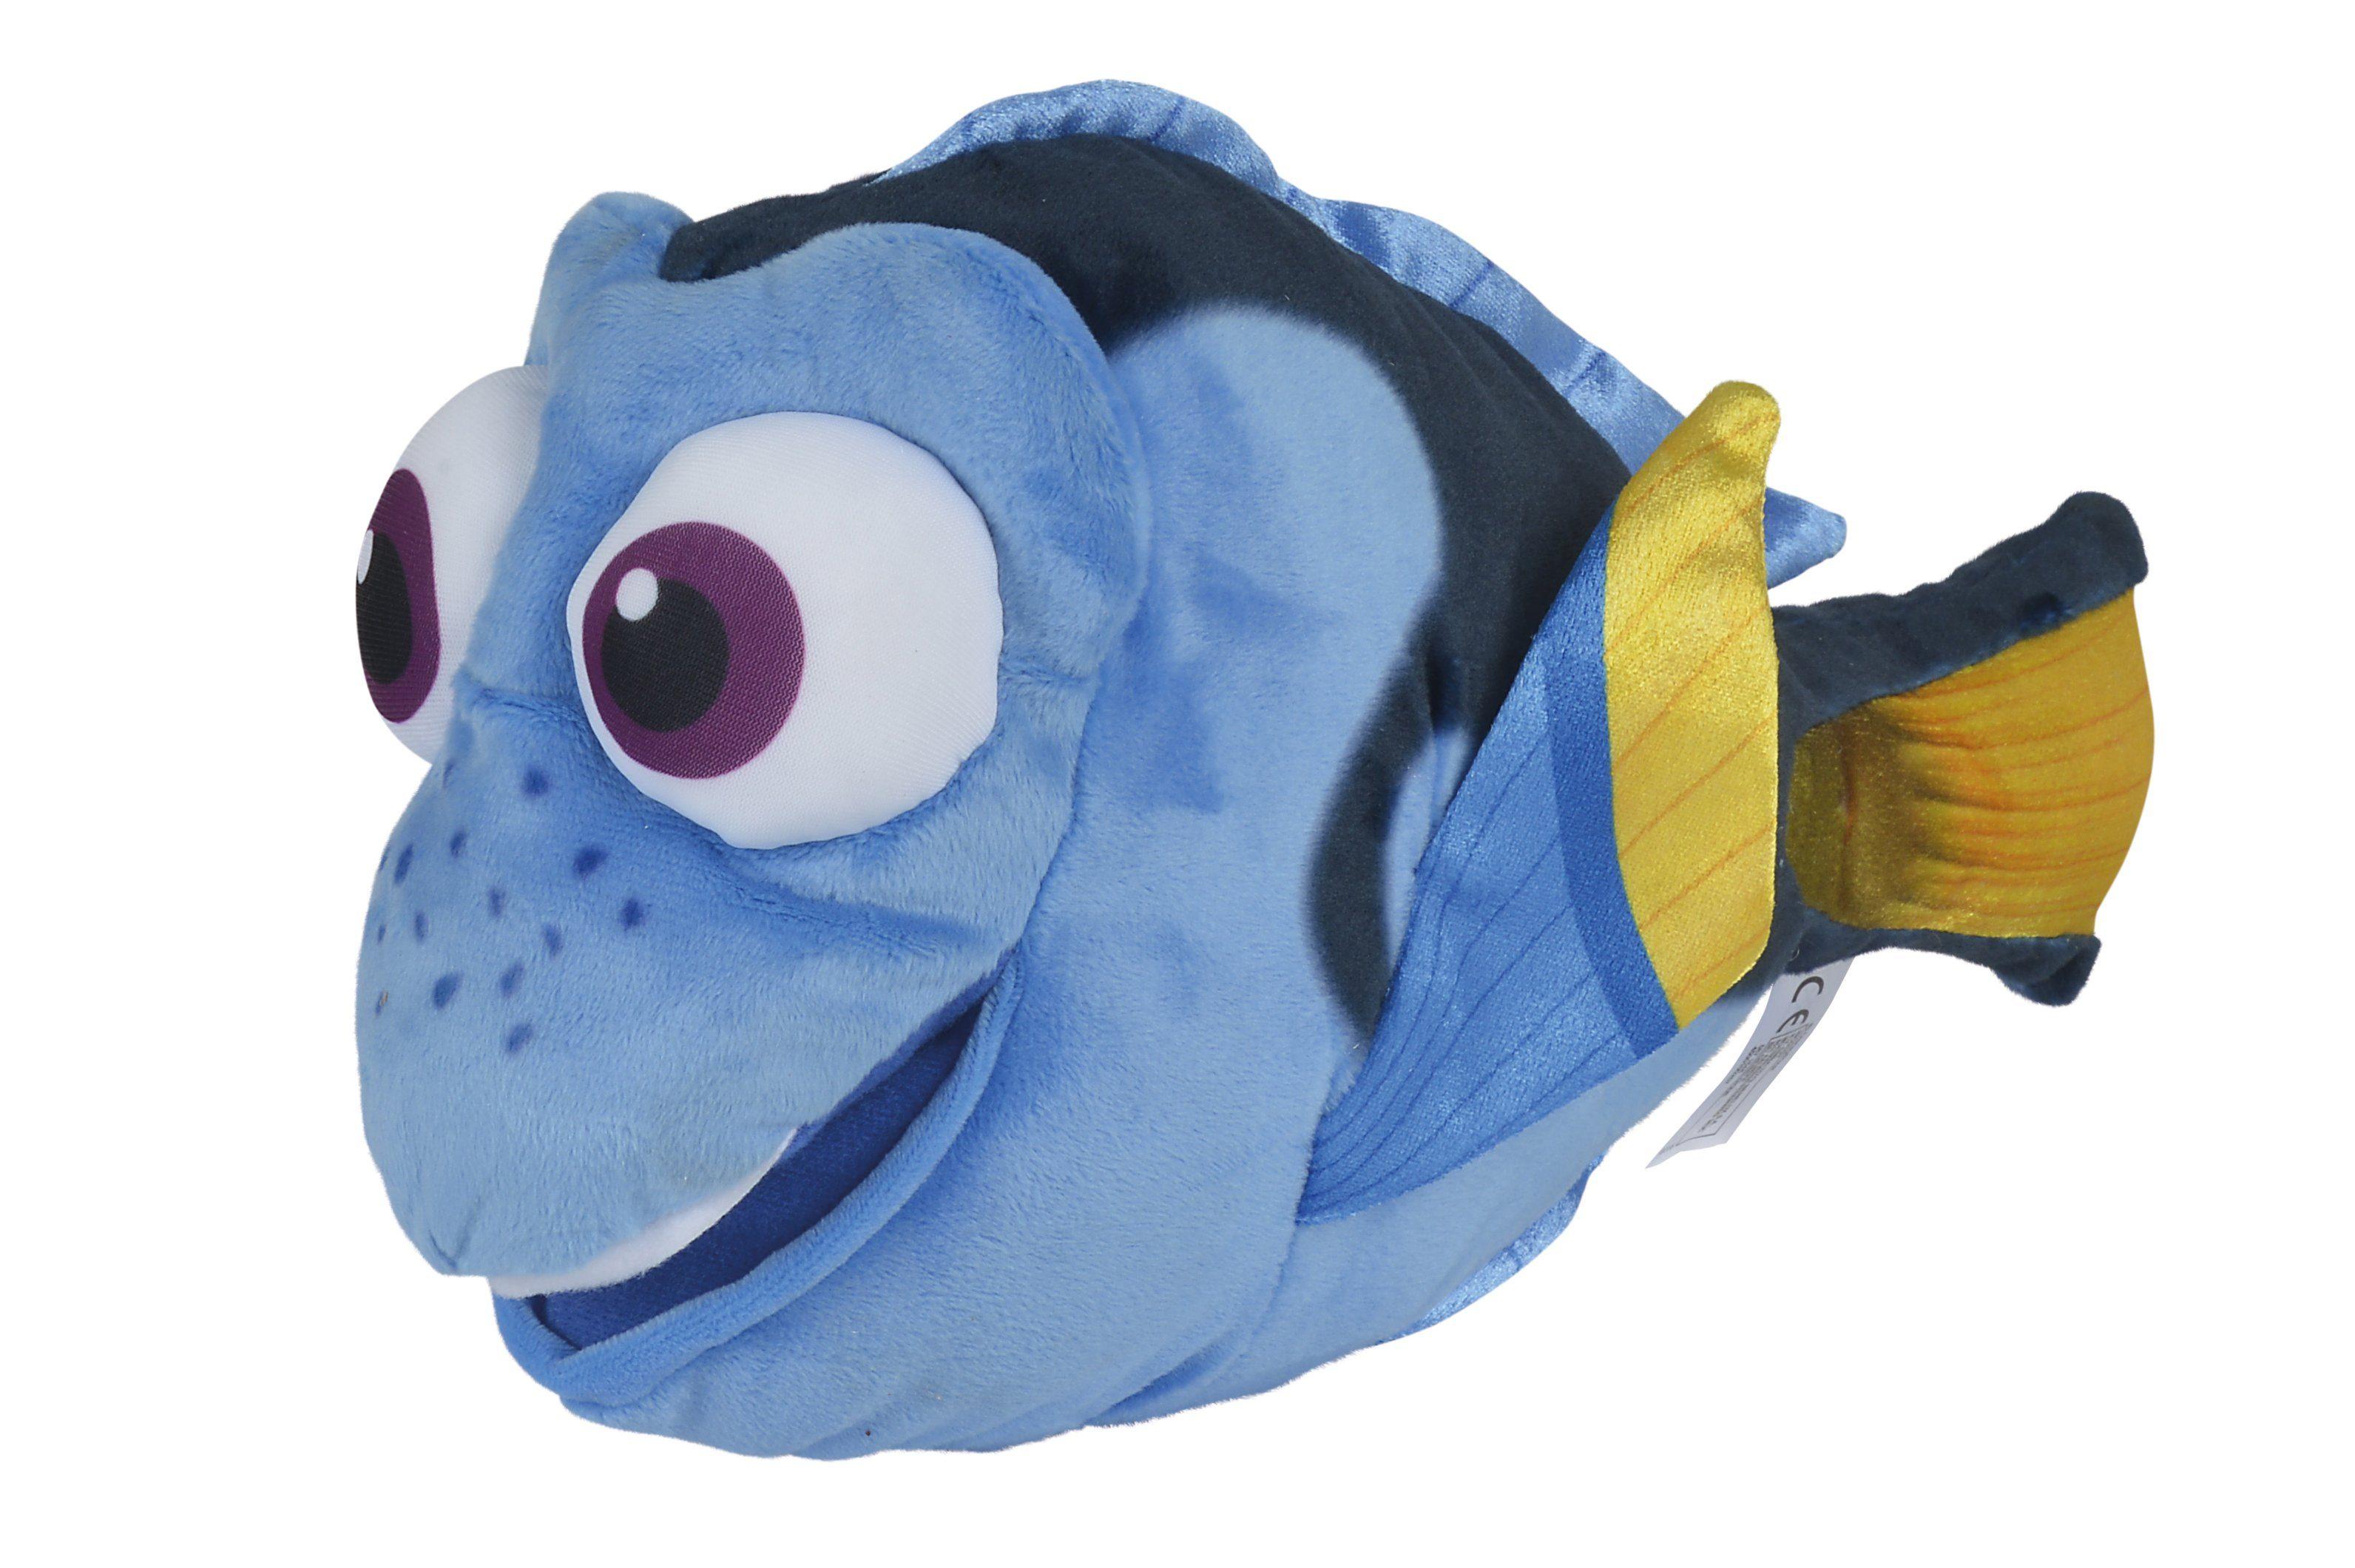 Simba Plüschtier Fisch, »Disney Finding Dory, Dory ca. 50 cm«